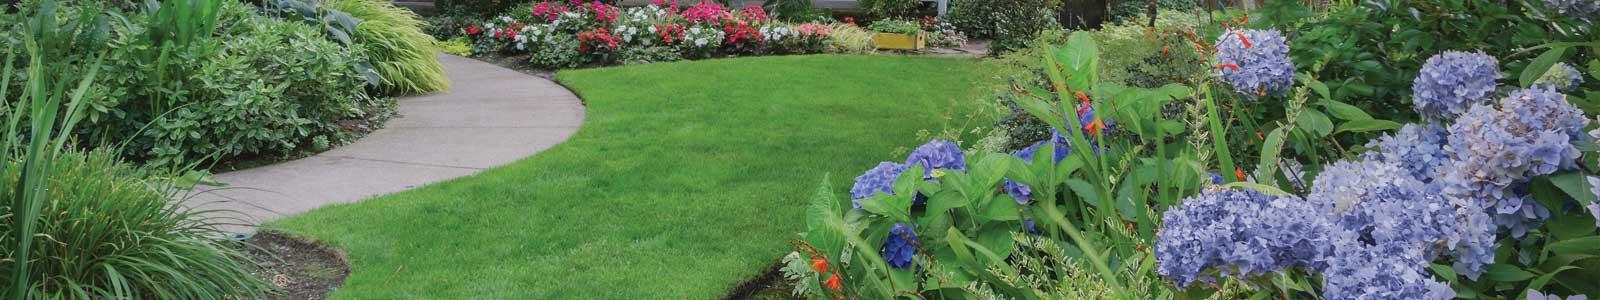 Cedar Hill Property Maintenance Landscape Services